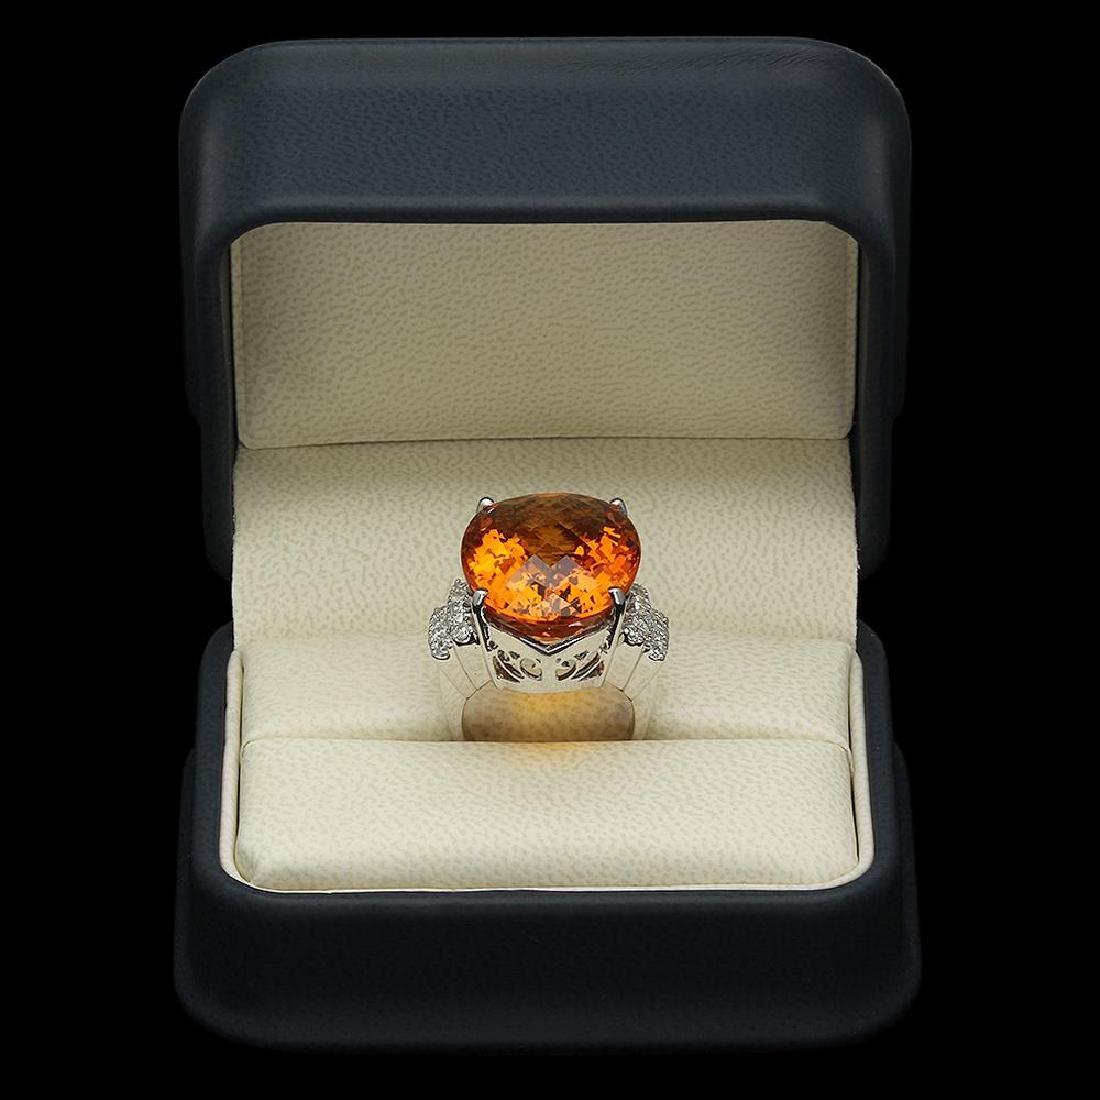 14K Gold 27.77ct Citrine 0.79ct Diamond Ring - 4